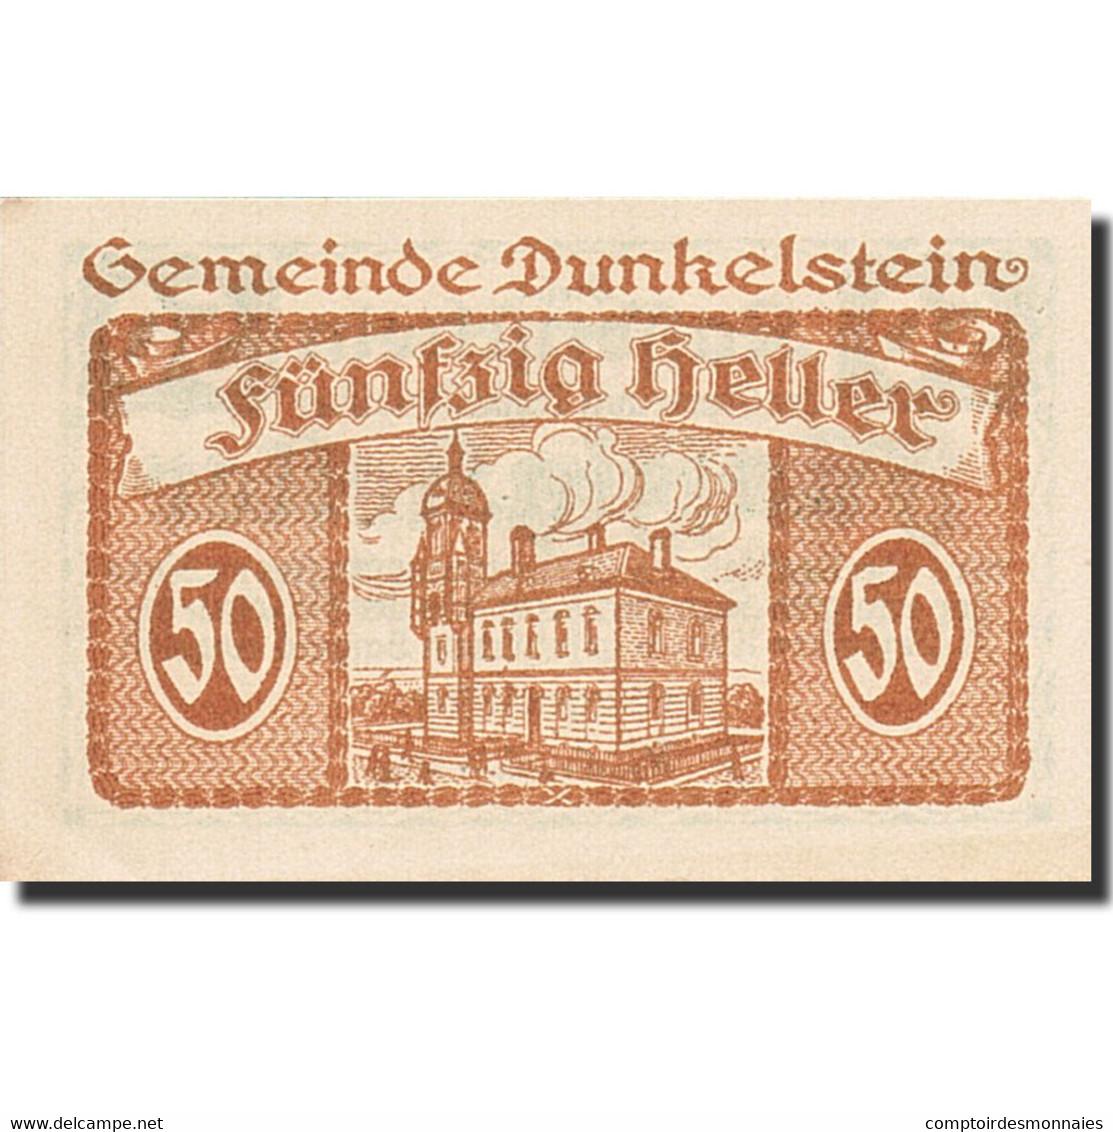 Autriche, Dunkelstein, 50 Heller, Château, 1920, 1920-12-31, SPL - Autriche